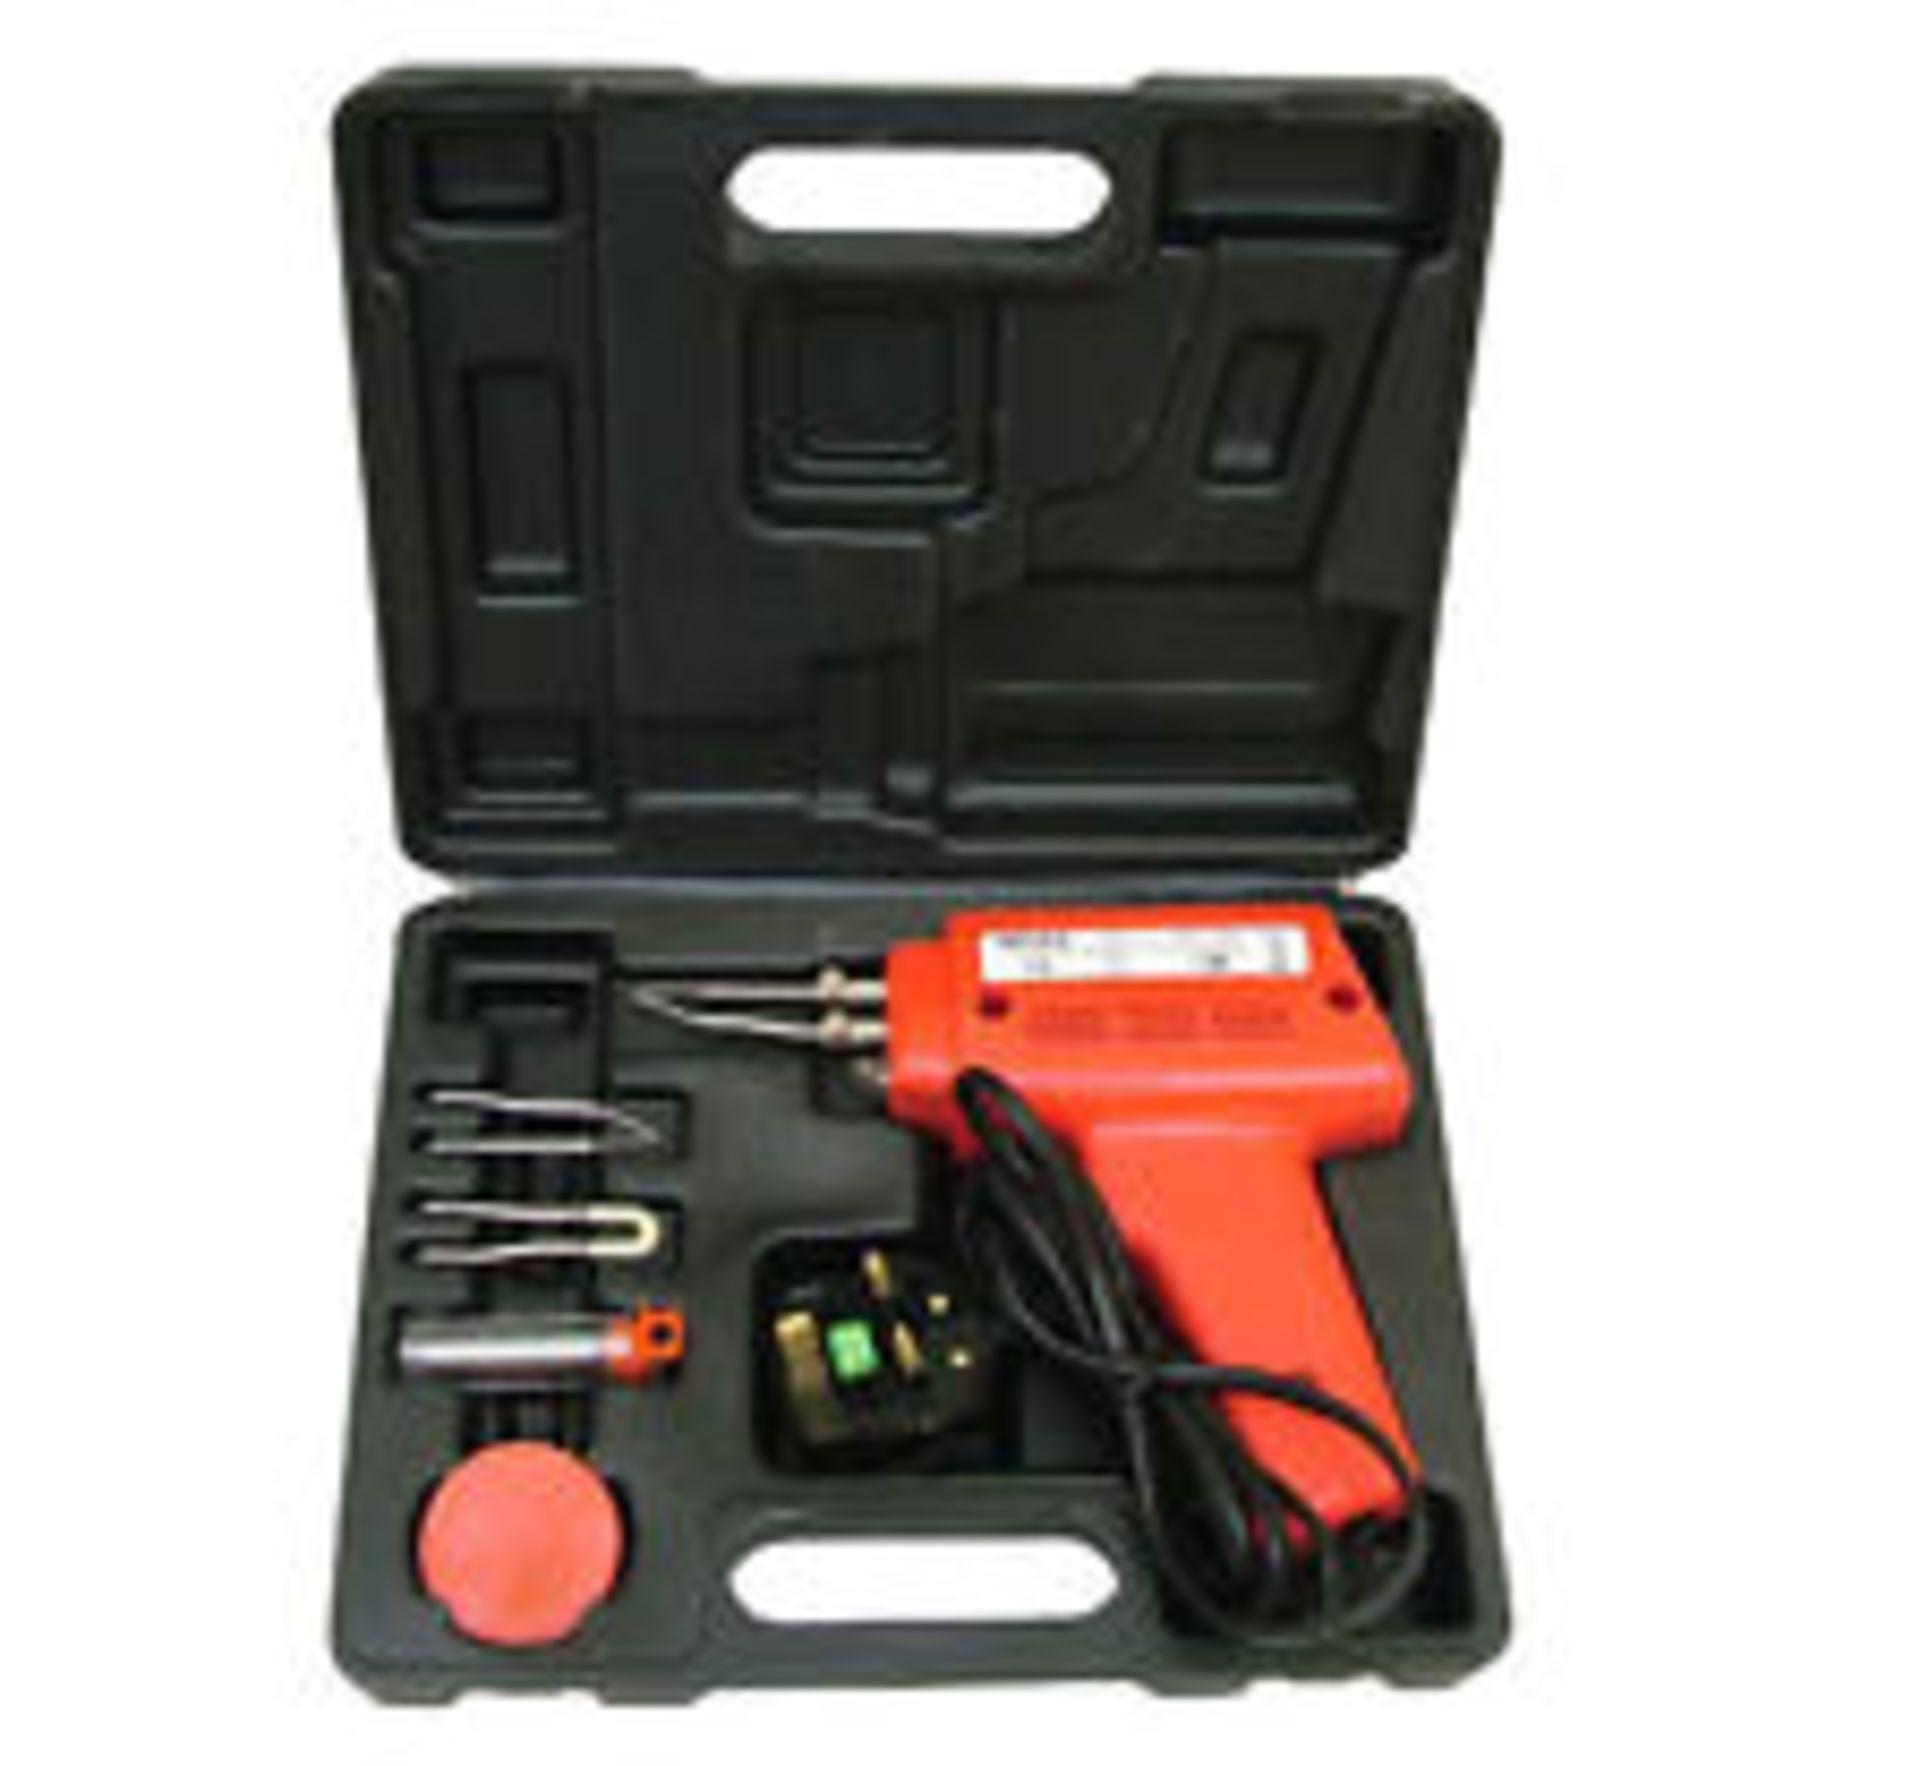 Lot 13612 - V Brand New 175 Watt Electric Soldering Gun Kit